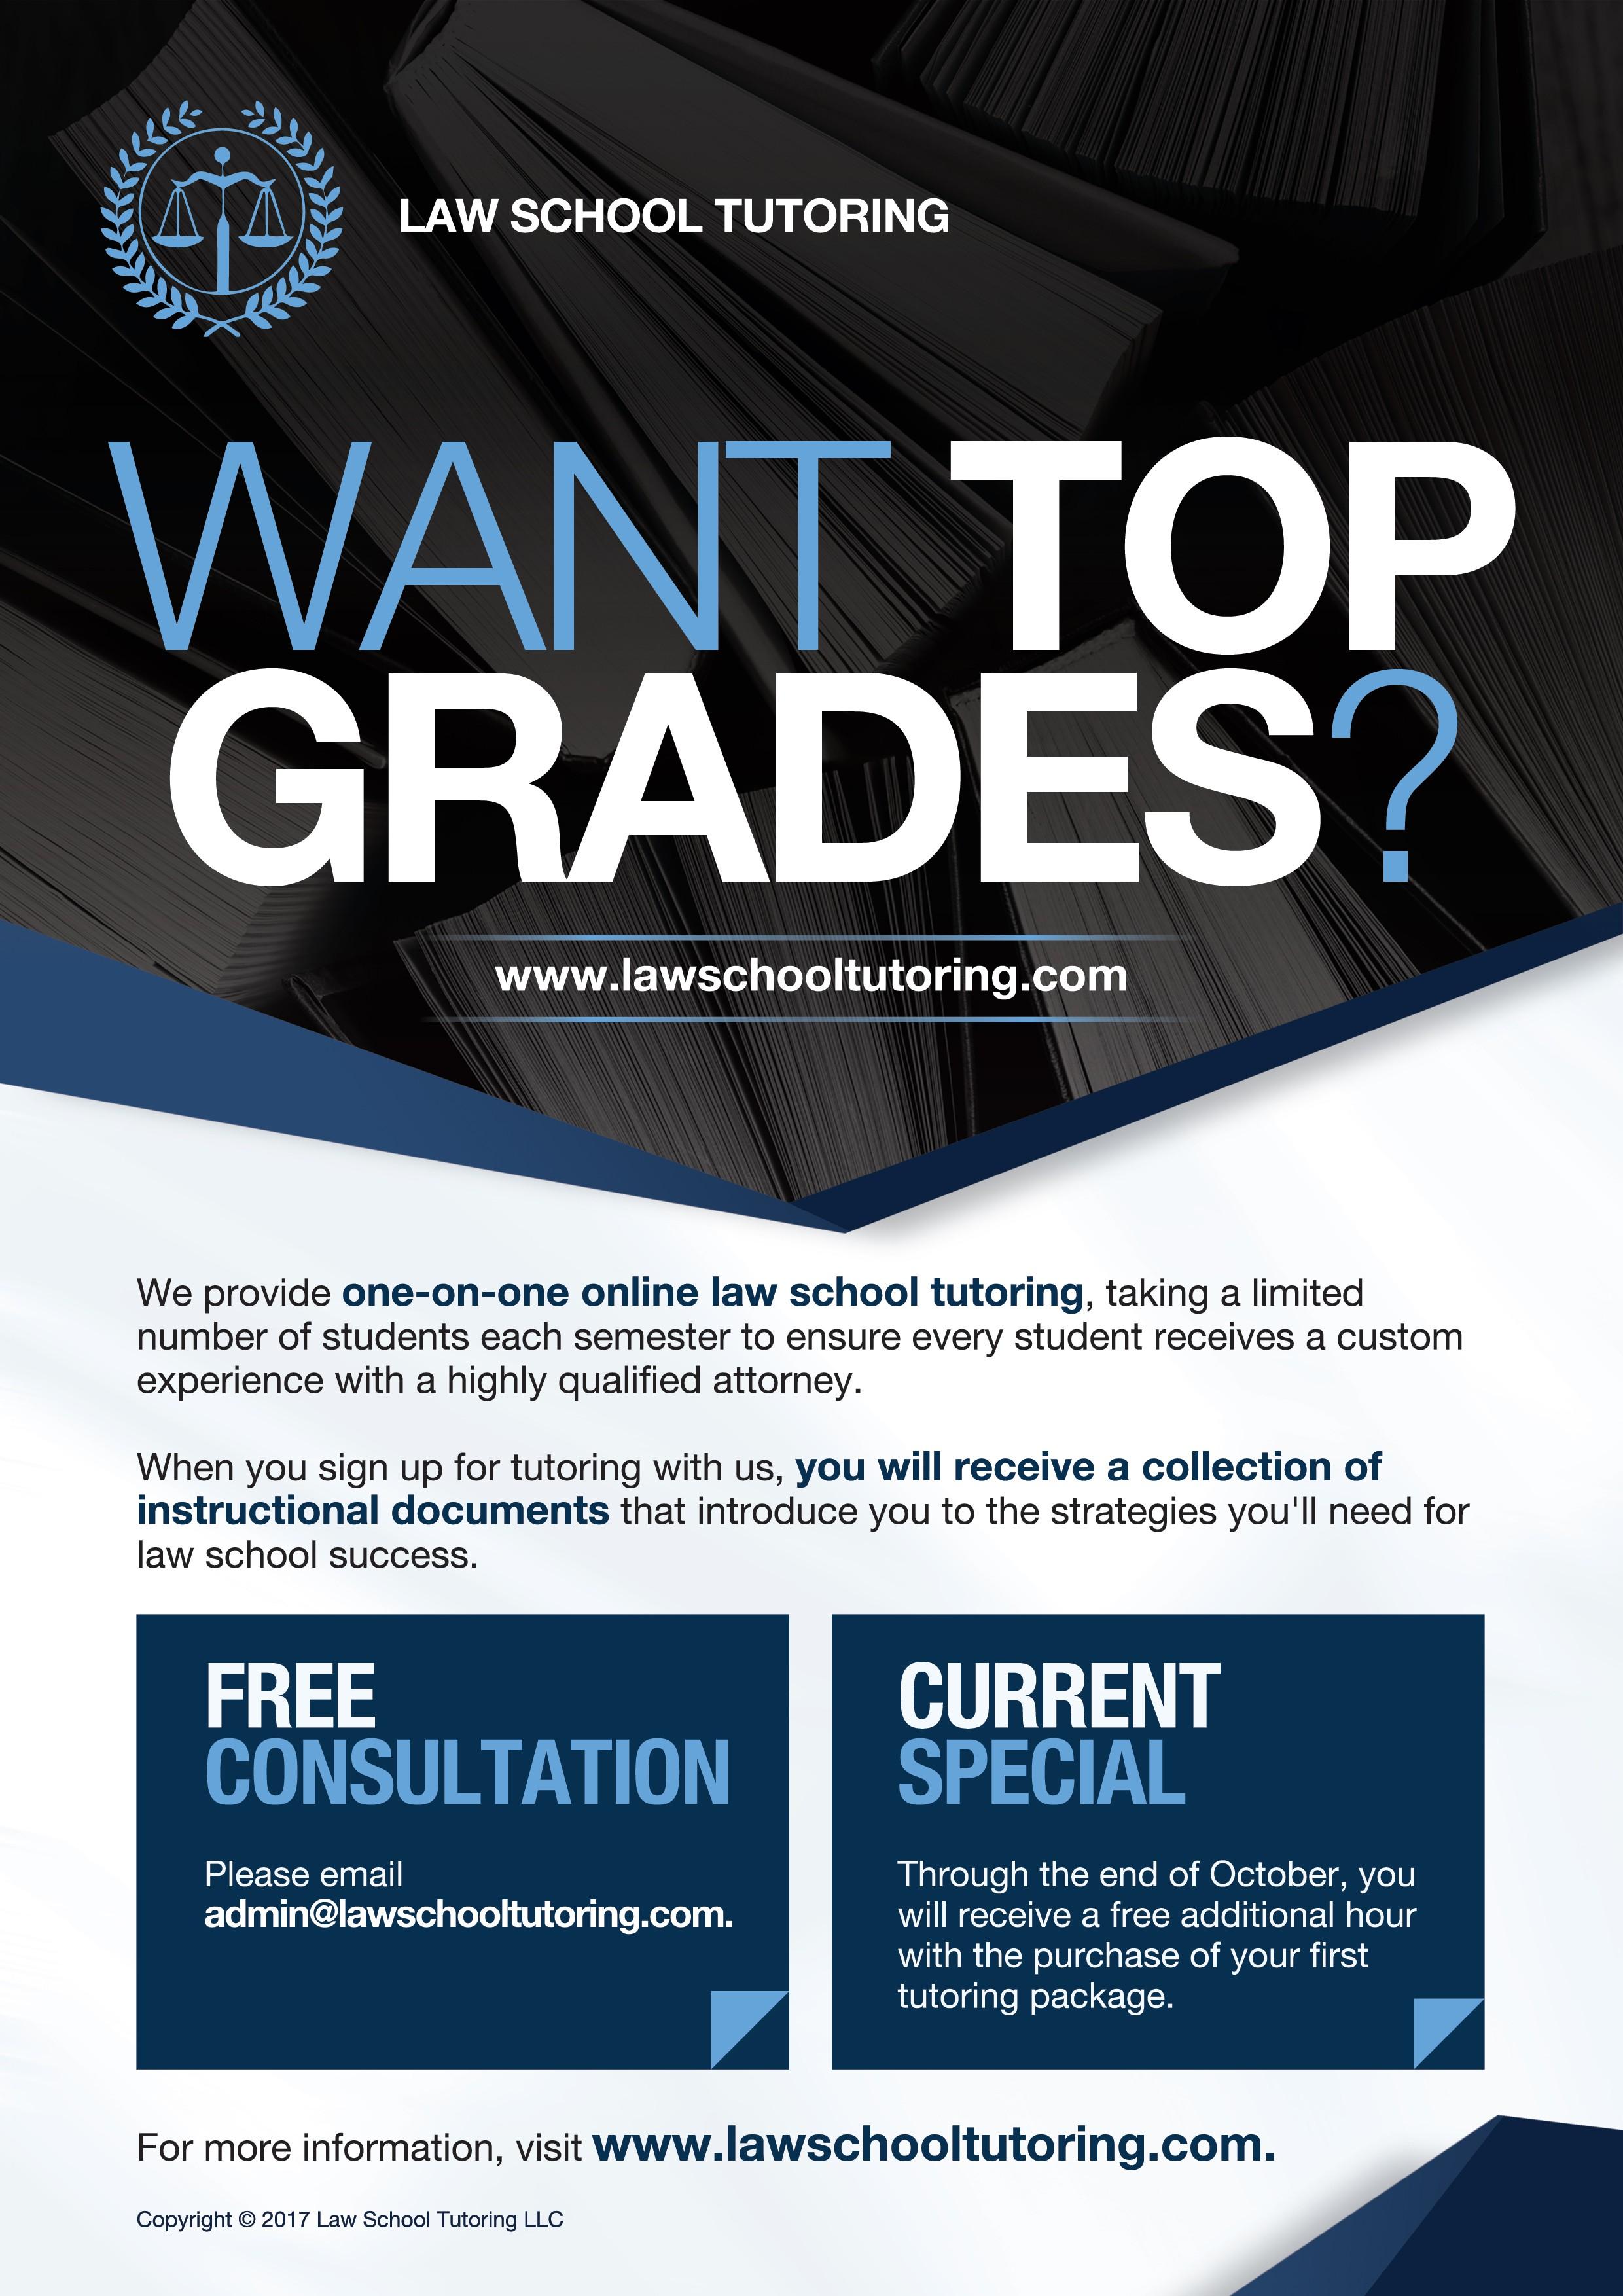 Design an eye-catching flyer for www.lawschooltutoring.com